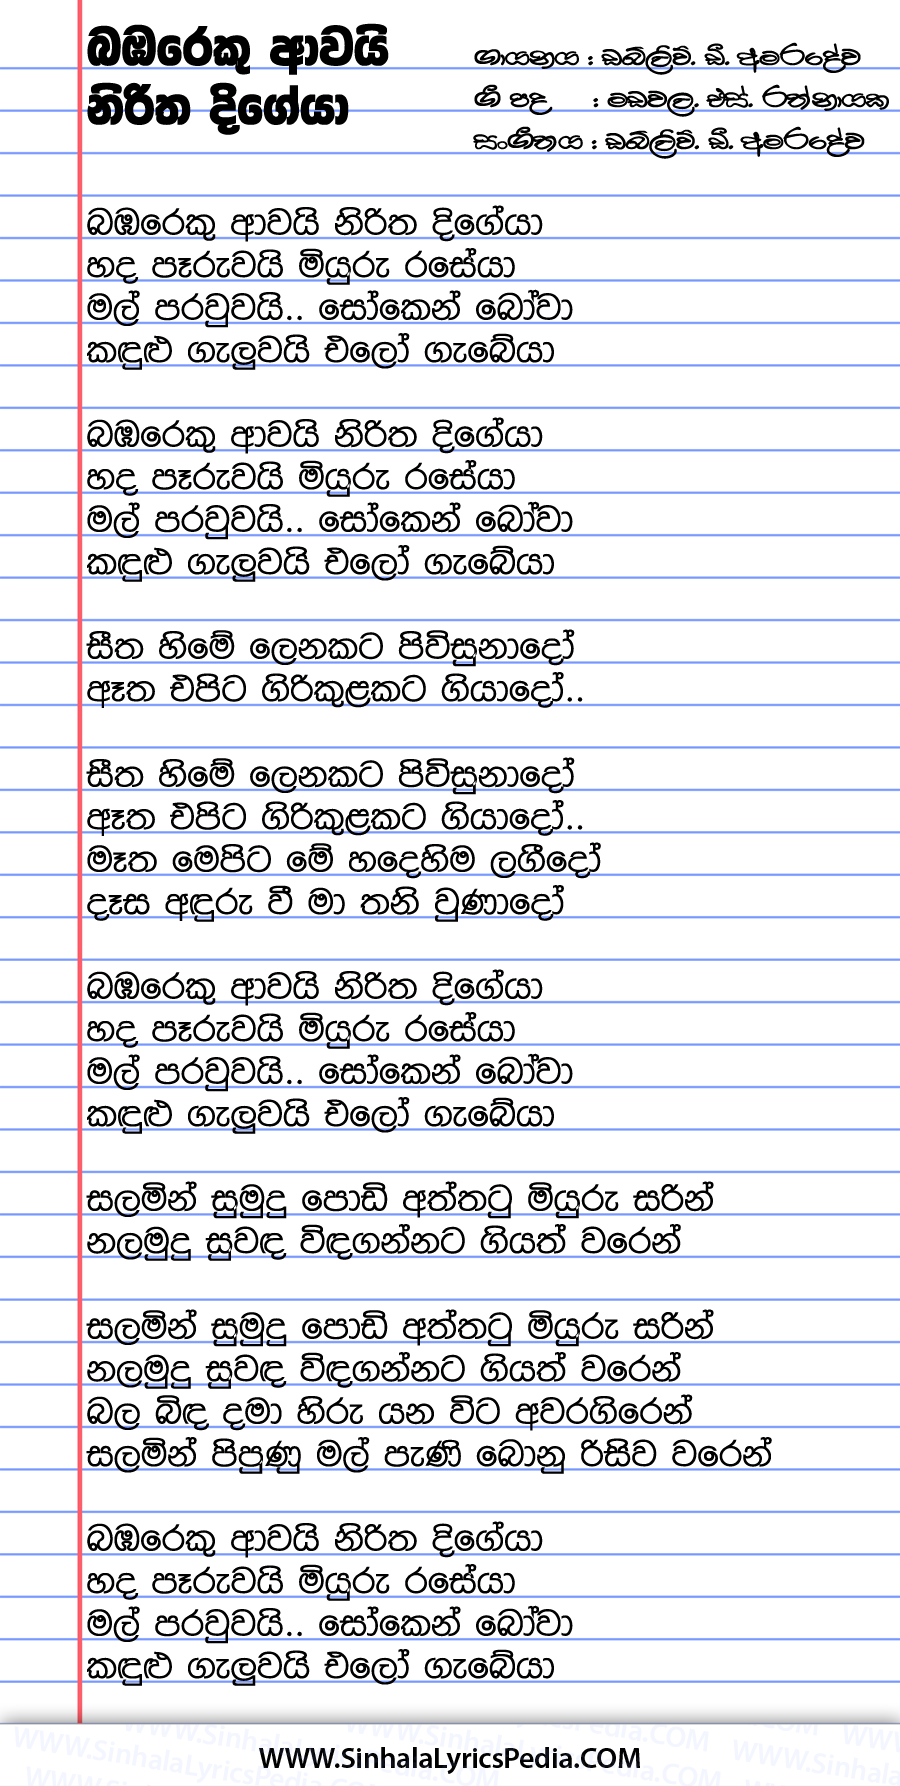 Bambareku Awai Niritha Digeya Song Lyrics